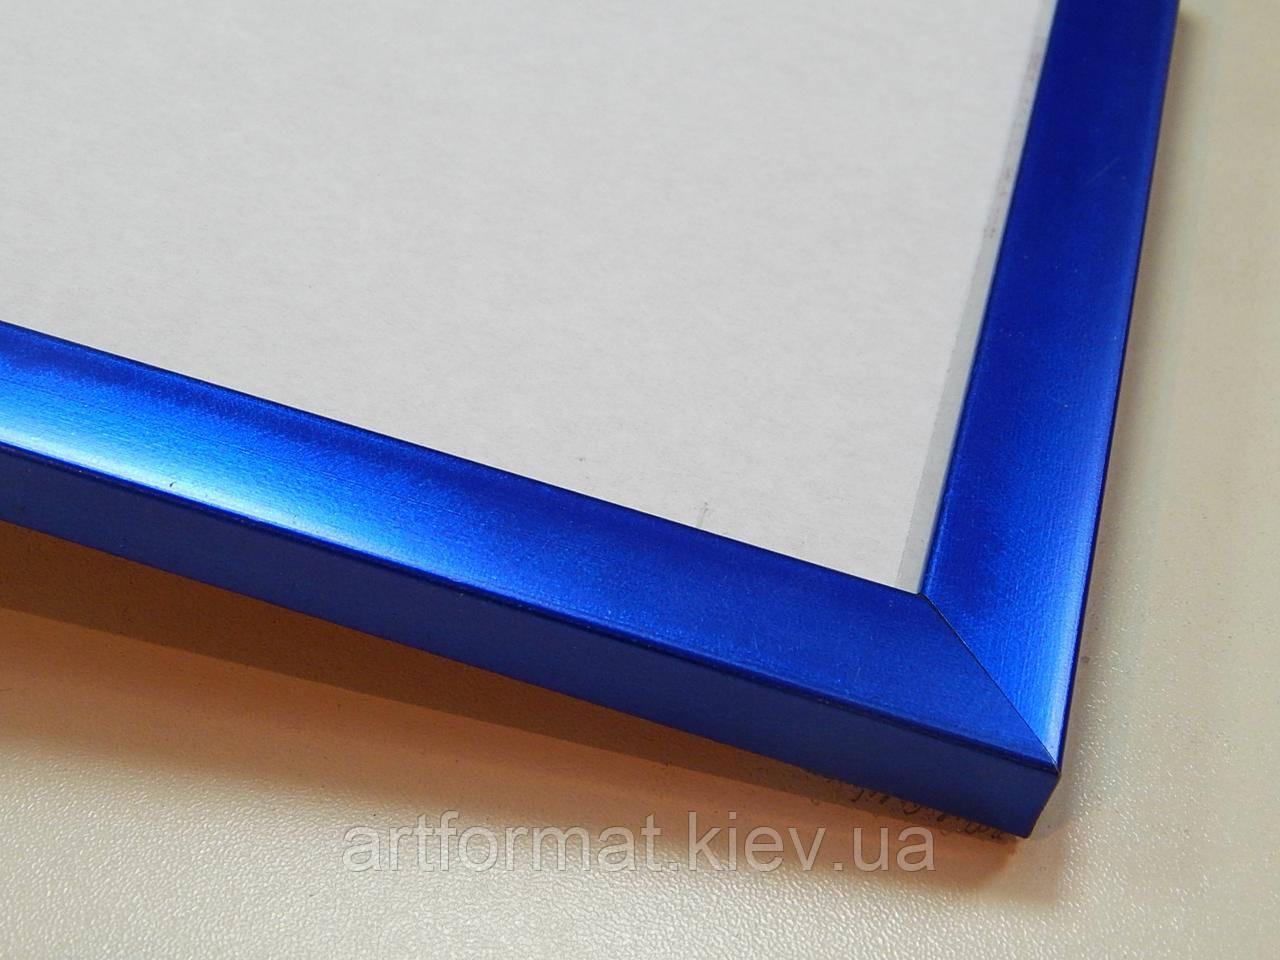 Рамка 30х40 16 мм.Синий металик.Европластик.